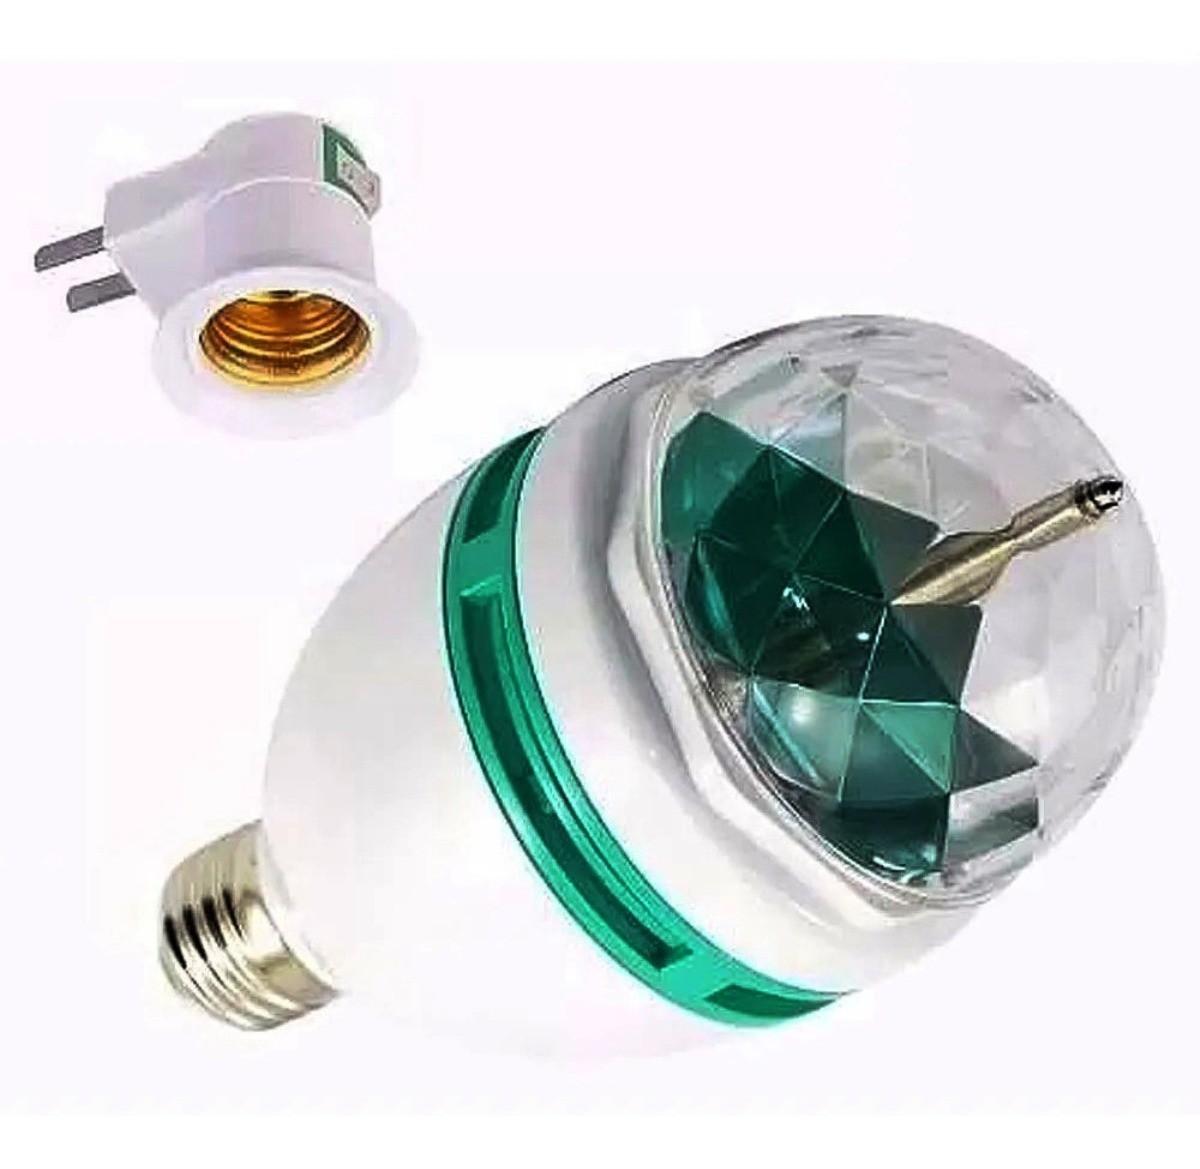 2 Lampada Dj Led Rgb Giratória Colorida 2 Mini laser Festas